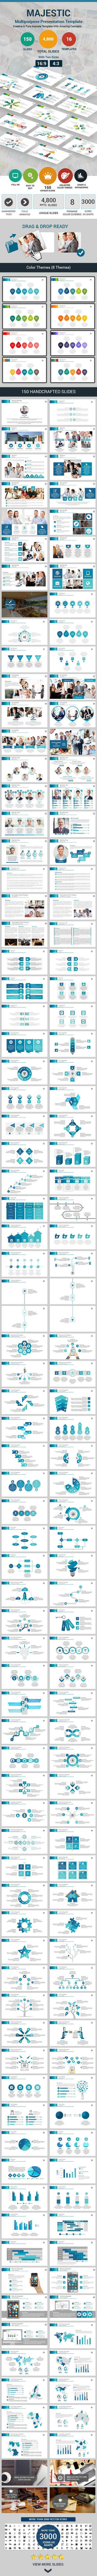 Majestic Multipurpose Keynote Presentation Templat - Business Keynote Templates